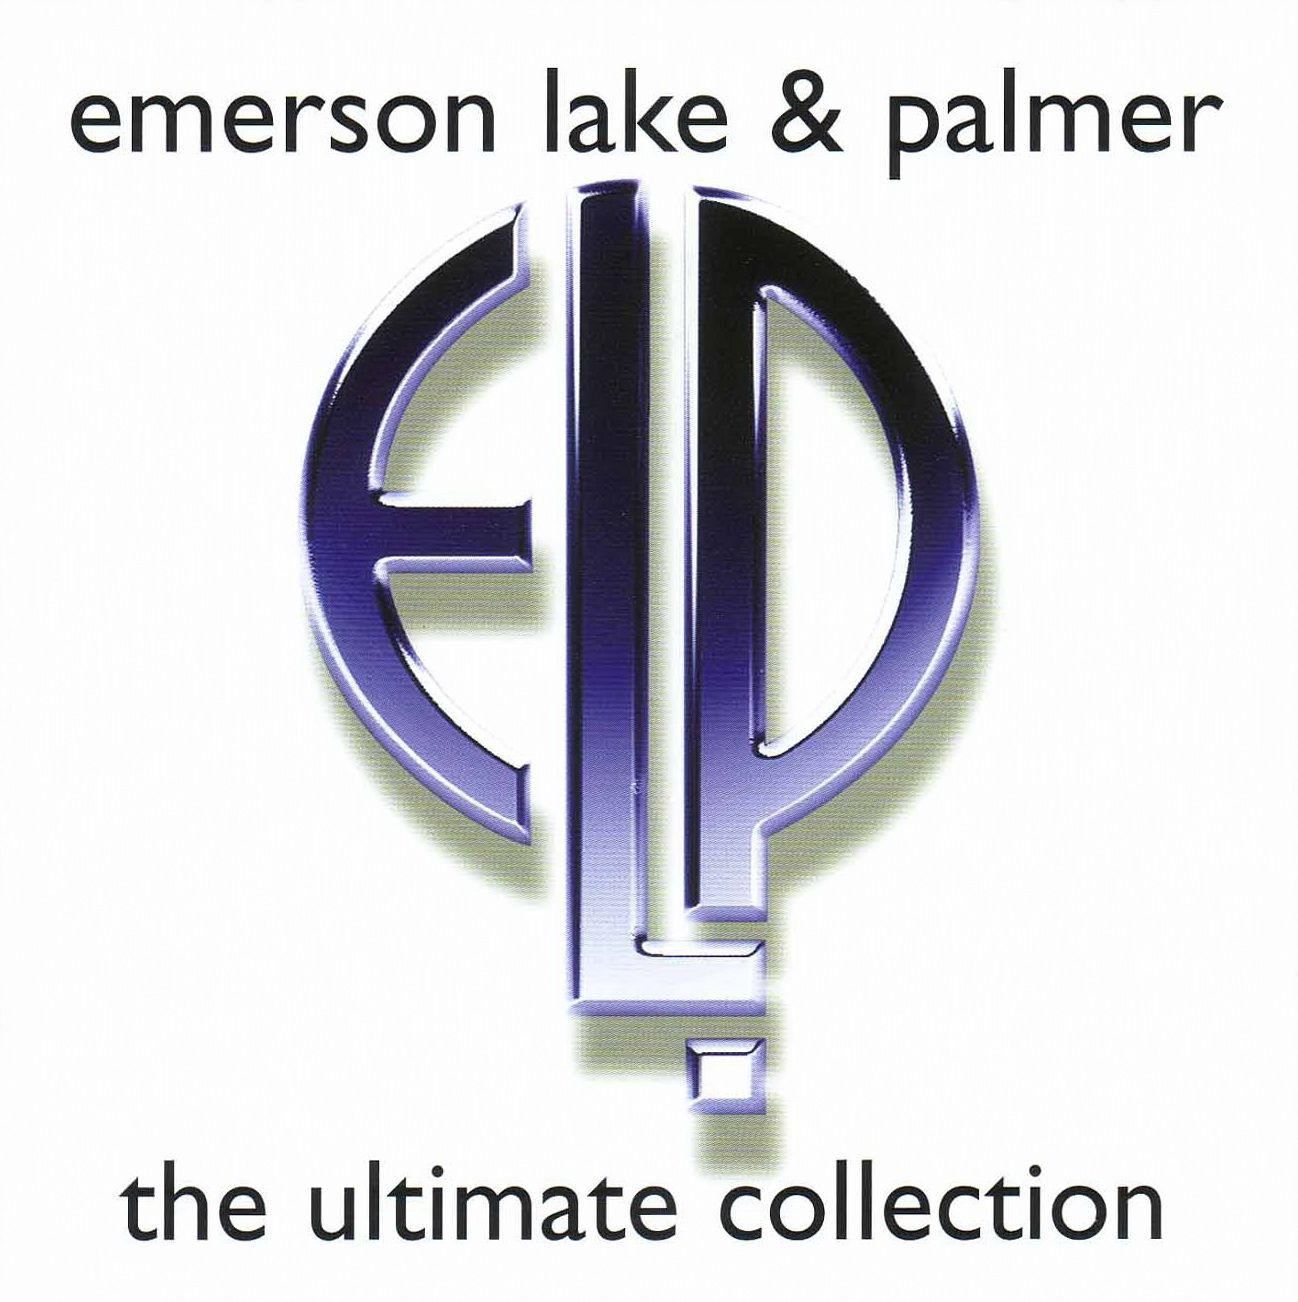 Emerson, Lake & Palmer - The Ultimate Collection album cover